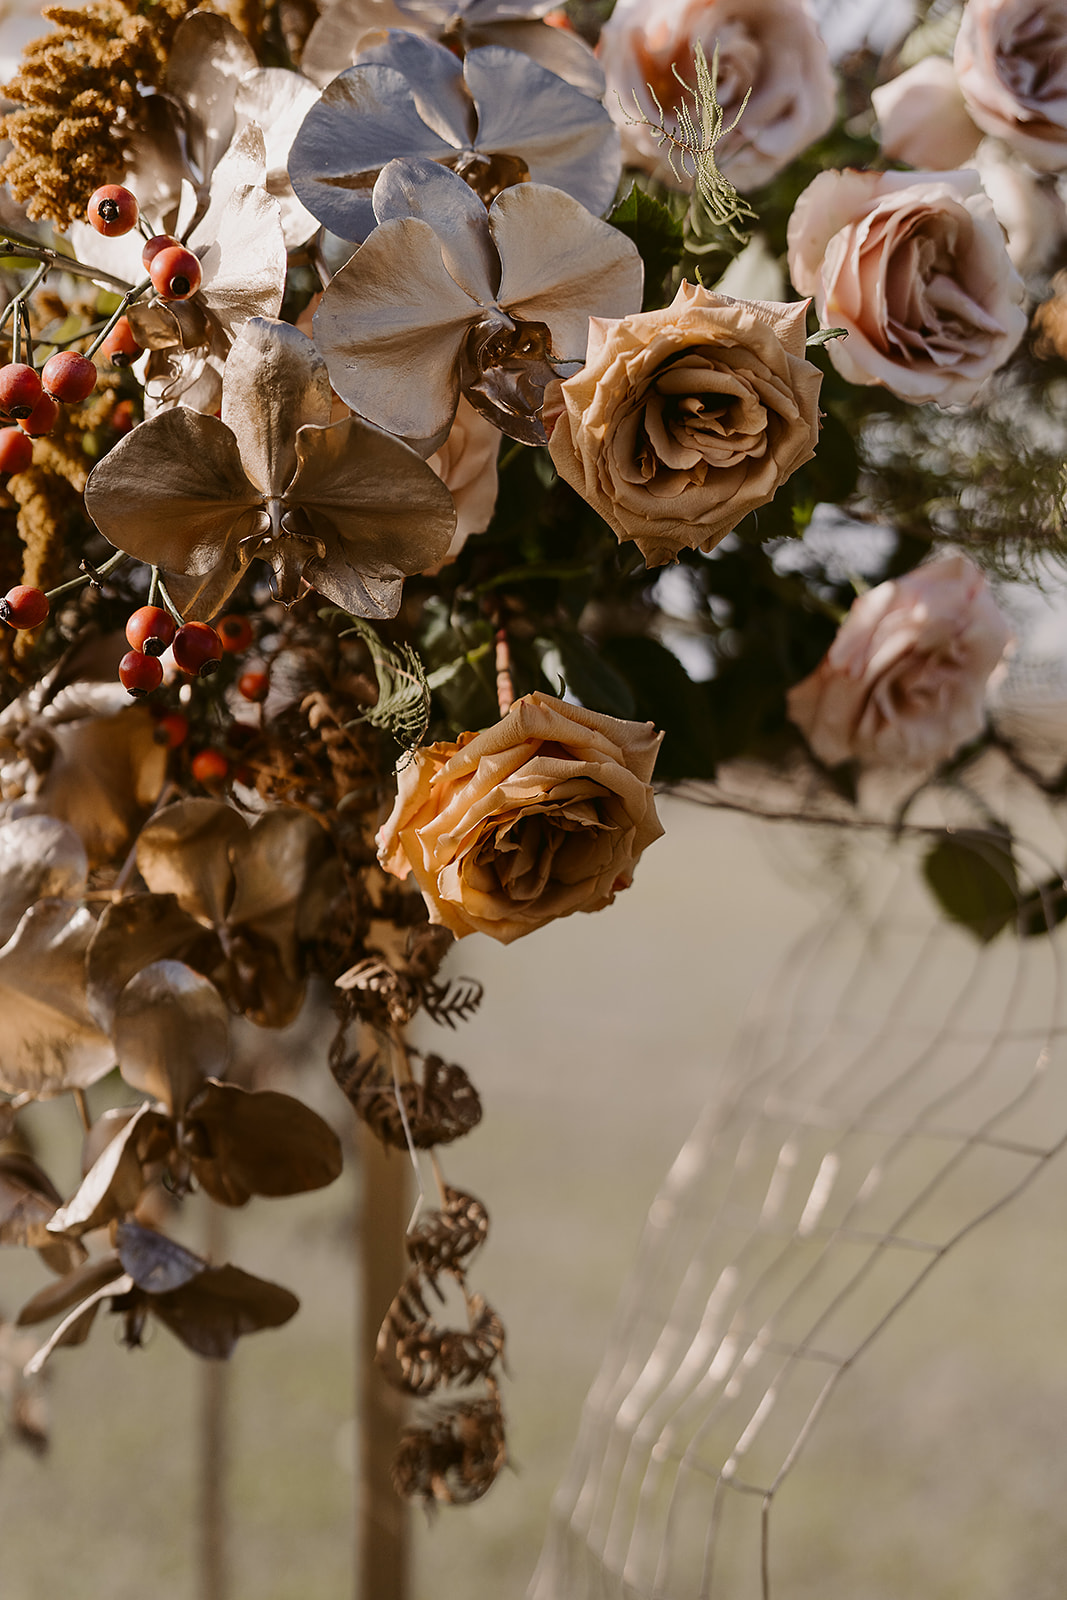 Immerse_Yarra_Valley_Same_Sex_Wedding_-_Ashleigh_Haase_Photography-246.jpg